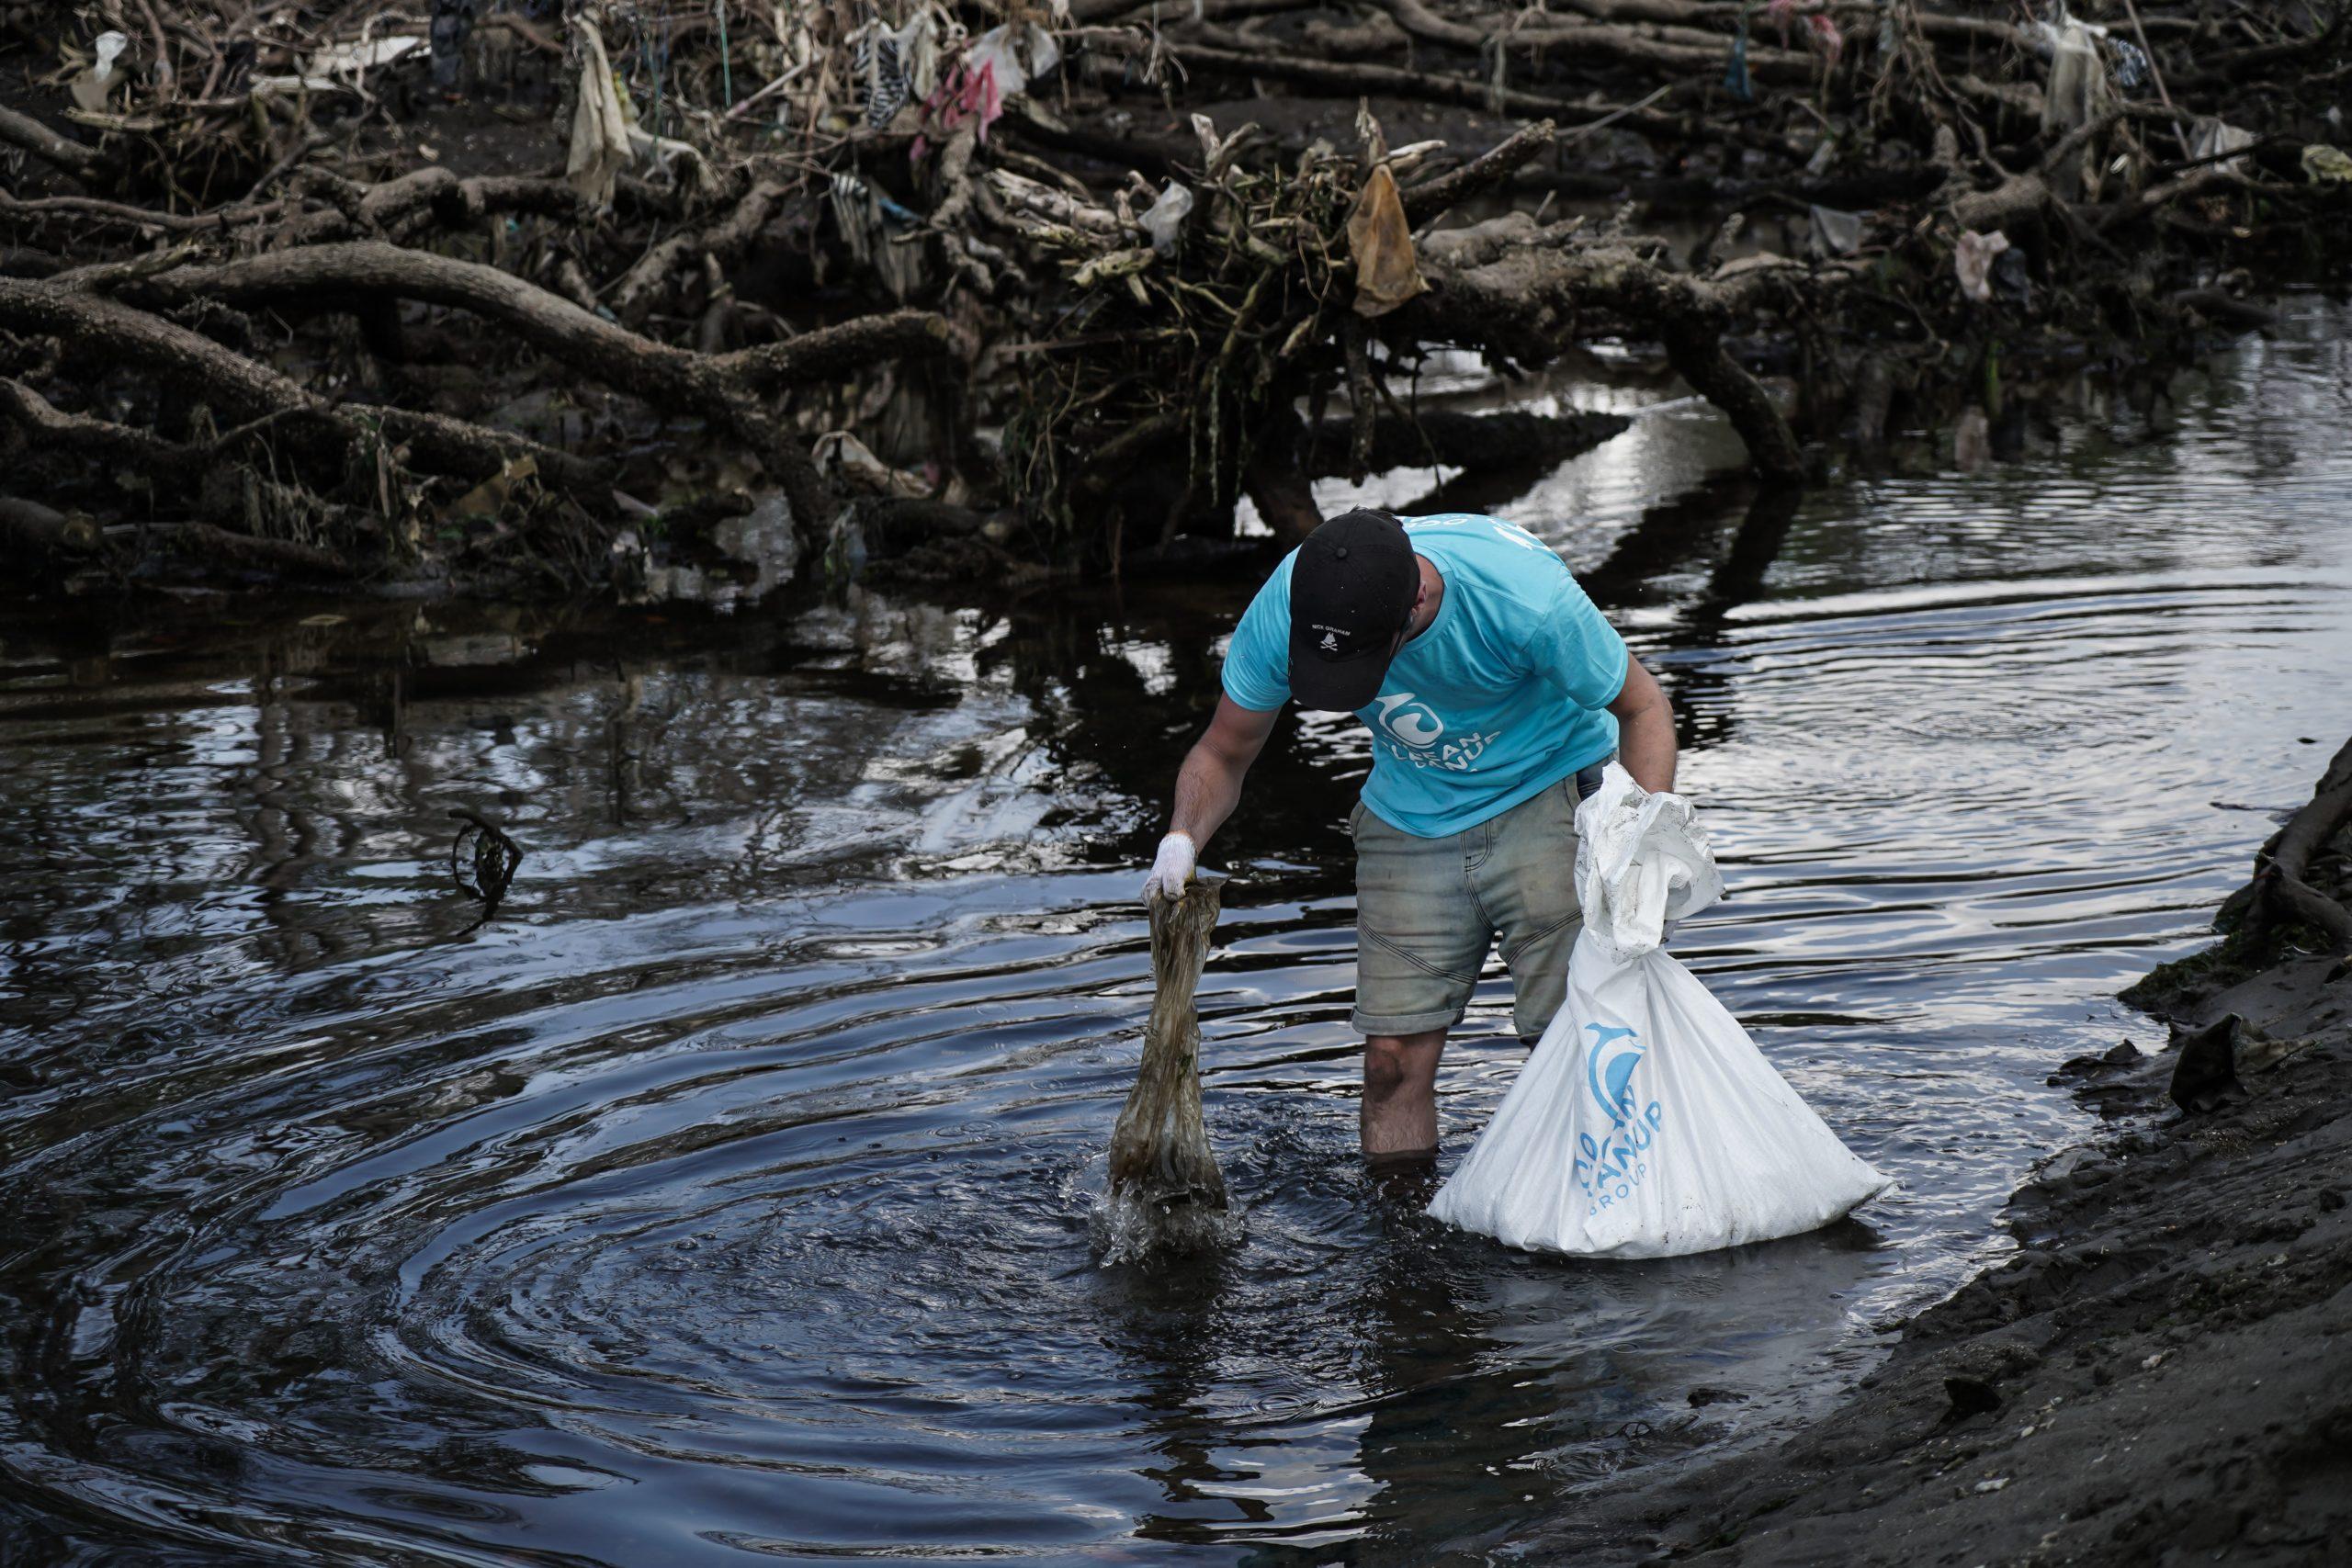 ocean-cleanup-group-lQX7uBDuOFQ-unsplash